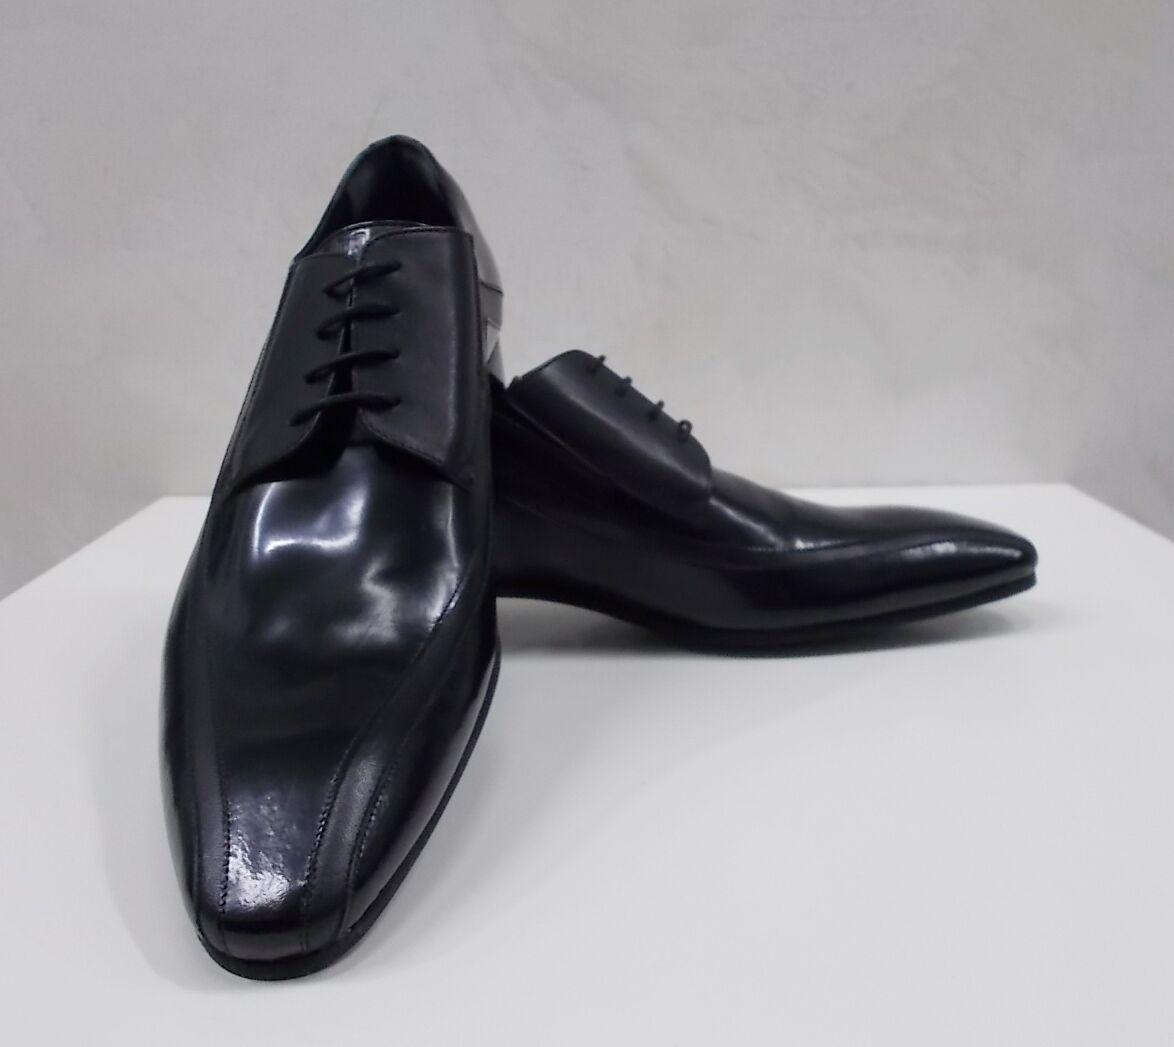 SCARPE SCARPE SCARPE UOMO CARLO 42  PIGNATELLI scarpe MAN 76c868